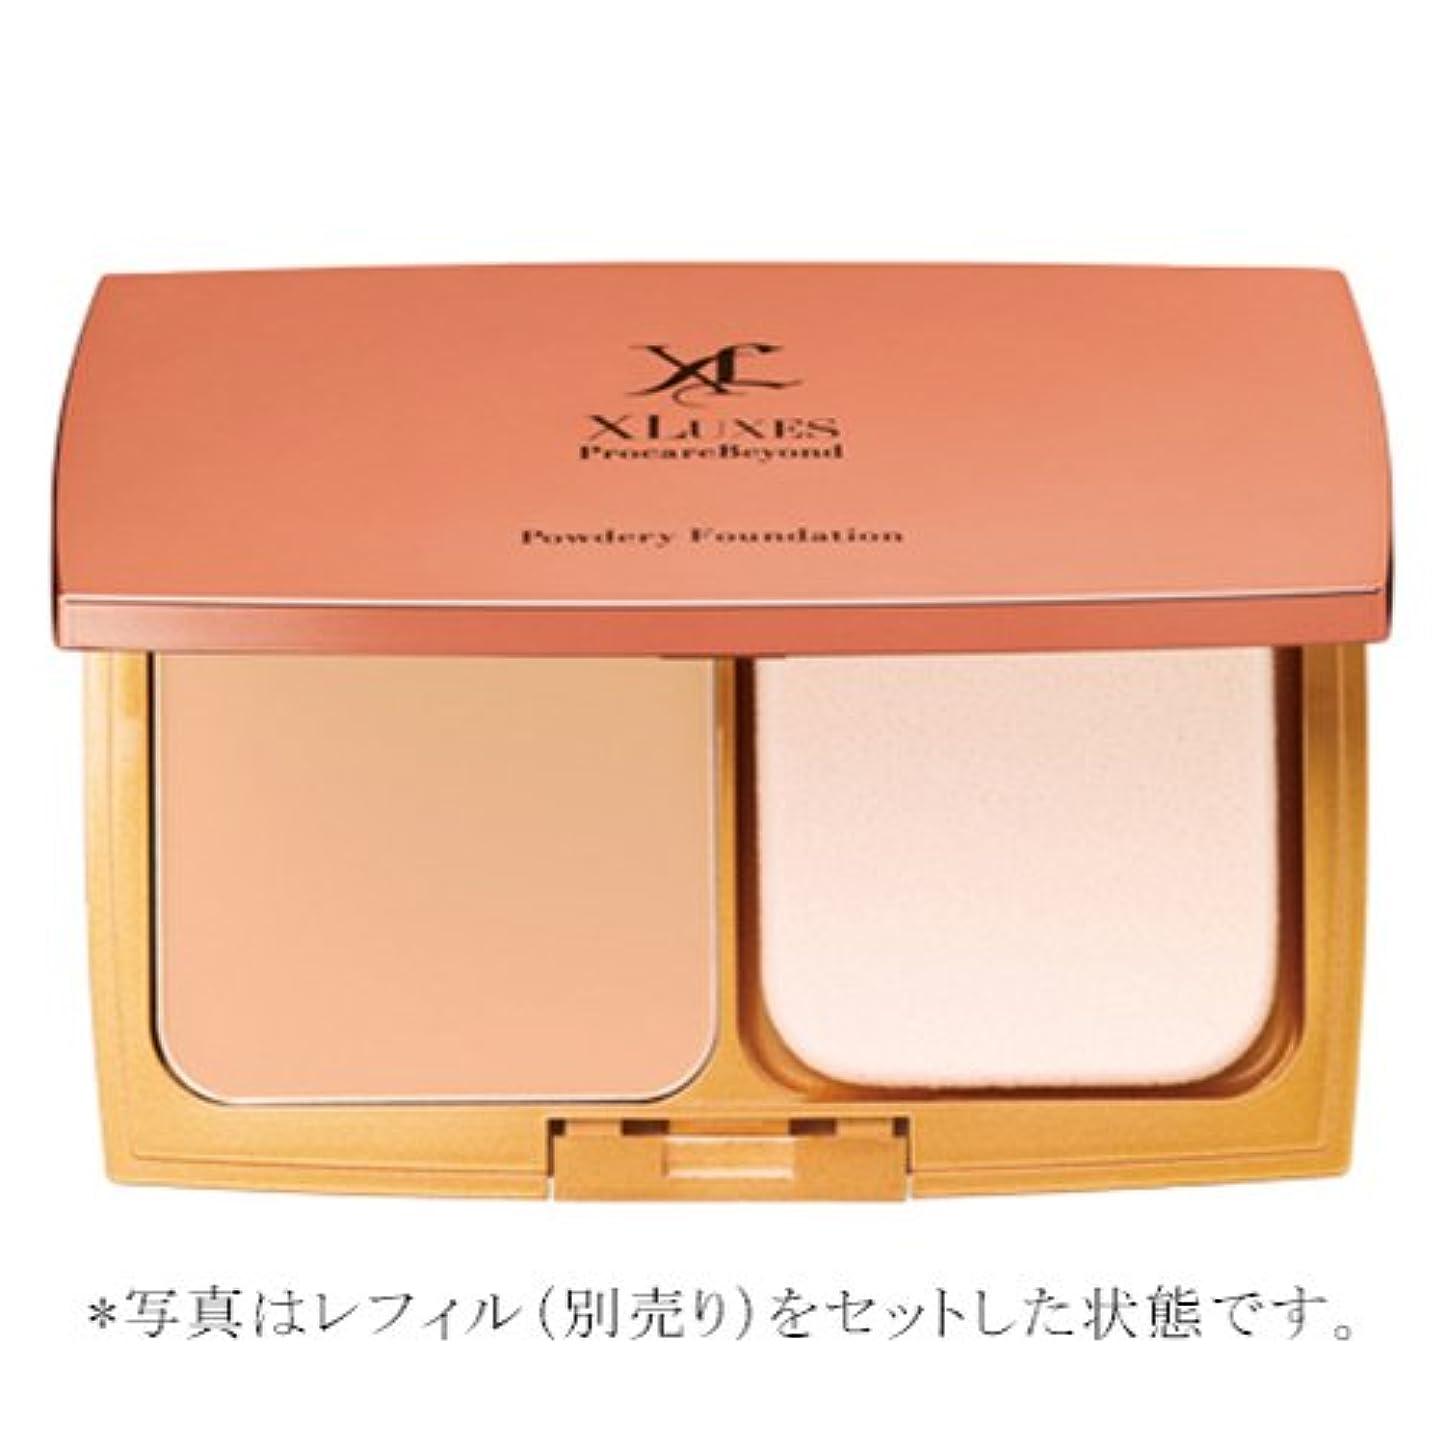 XLUXES パウダリーファンデーション専用ケース (パフ付) プロケアビヨンド